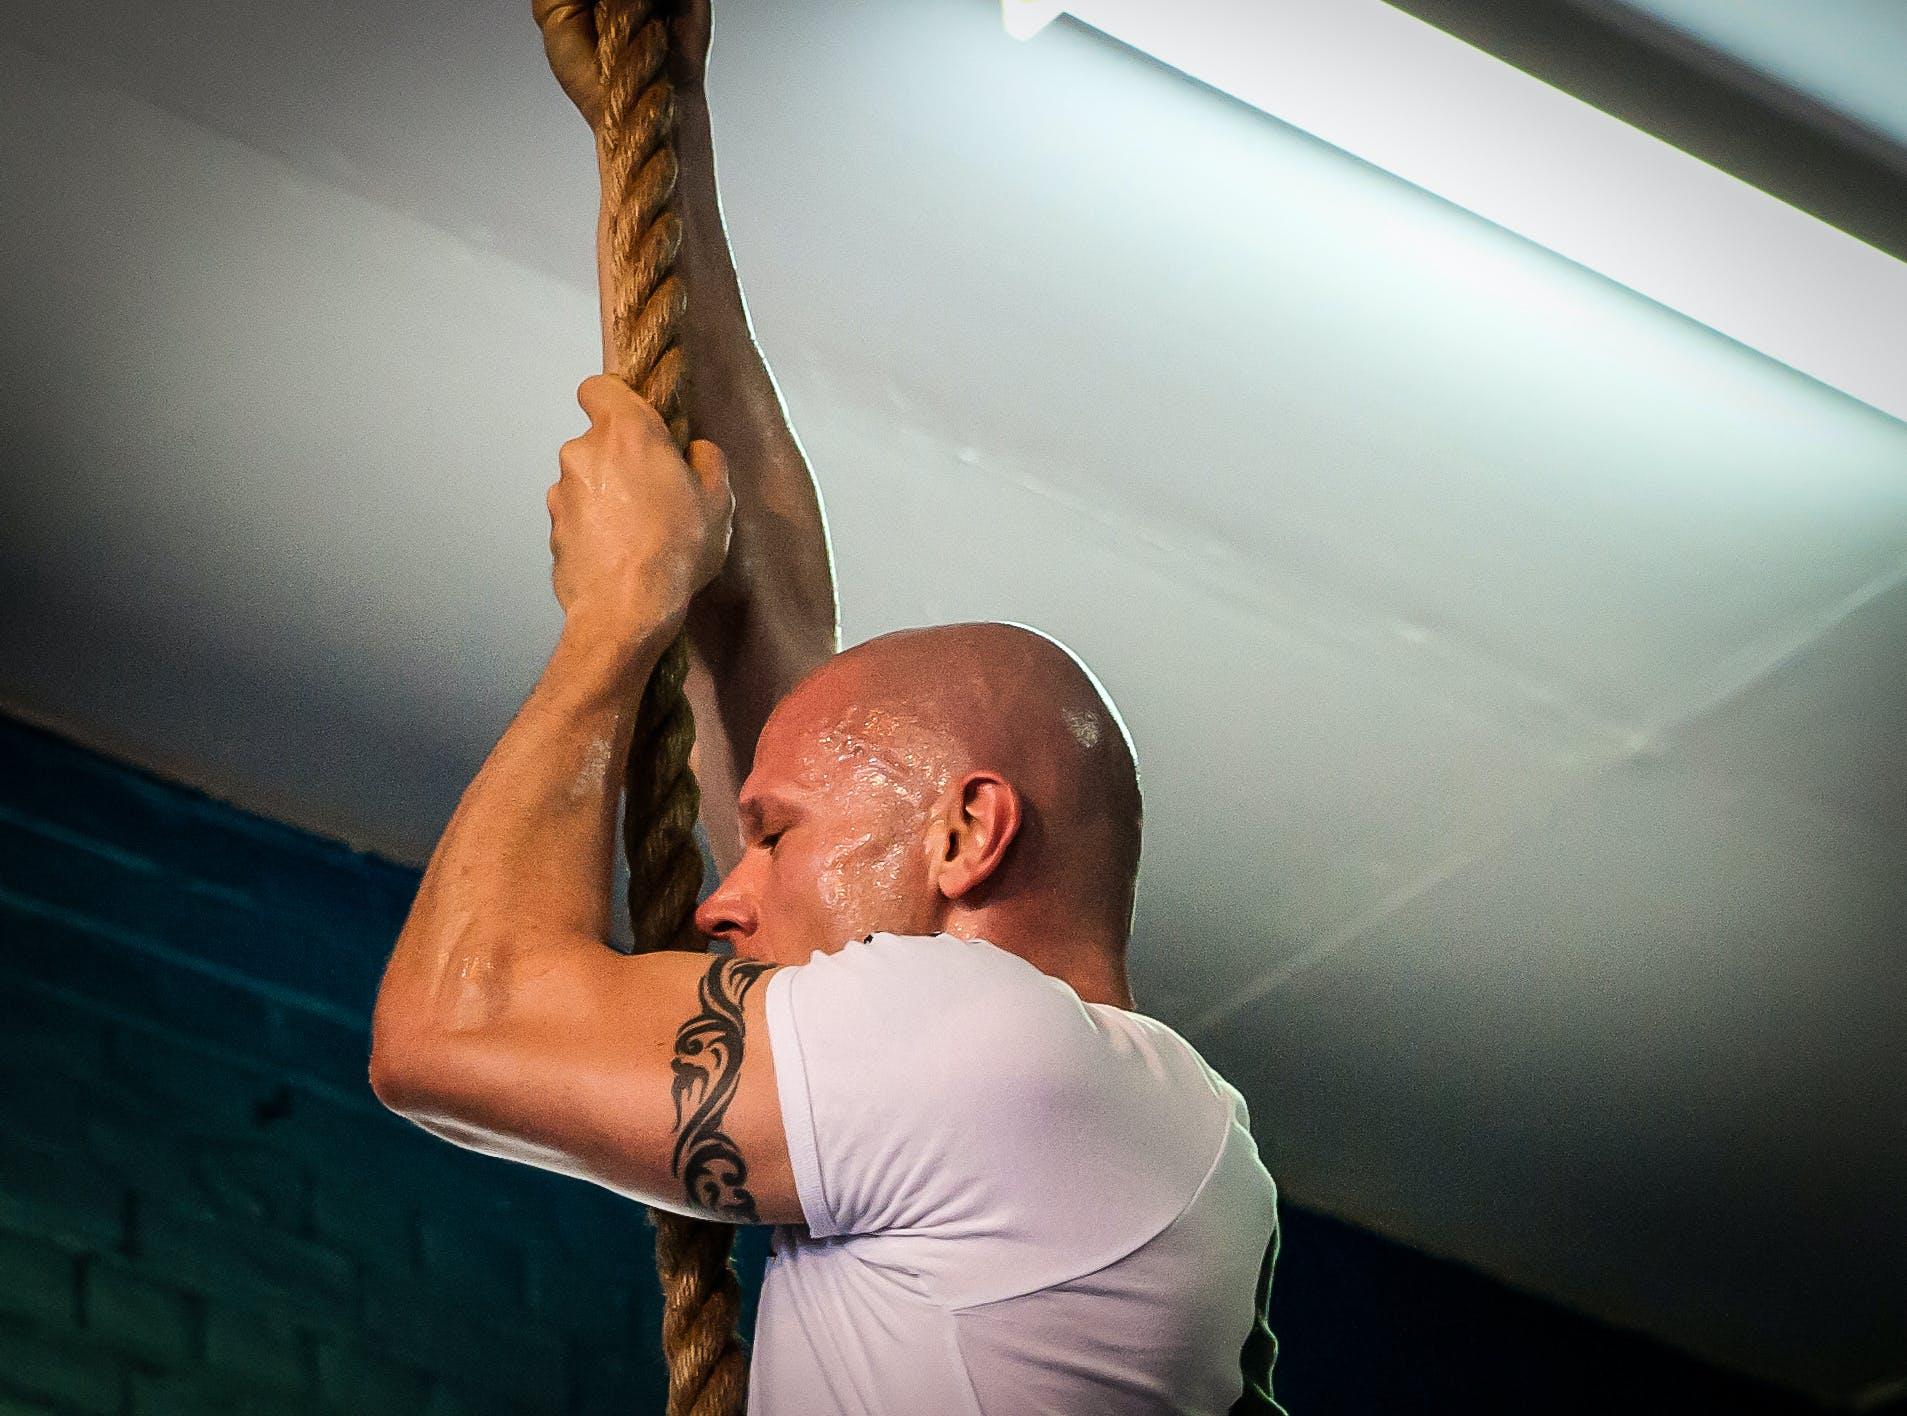 Free stock photo of crossfit, taco fleur, cavemantraining, rope climb